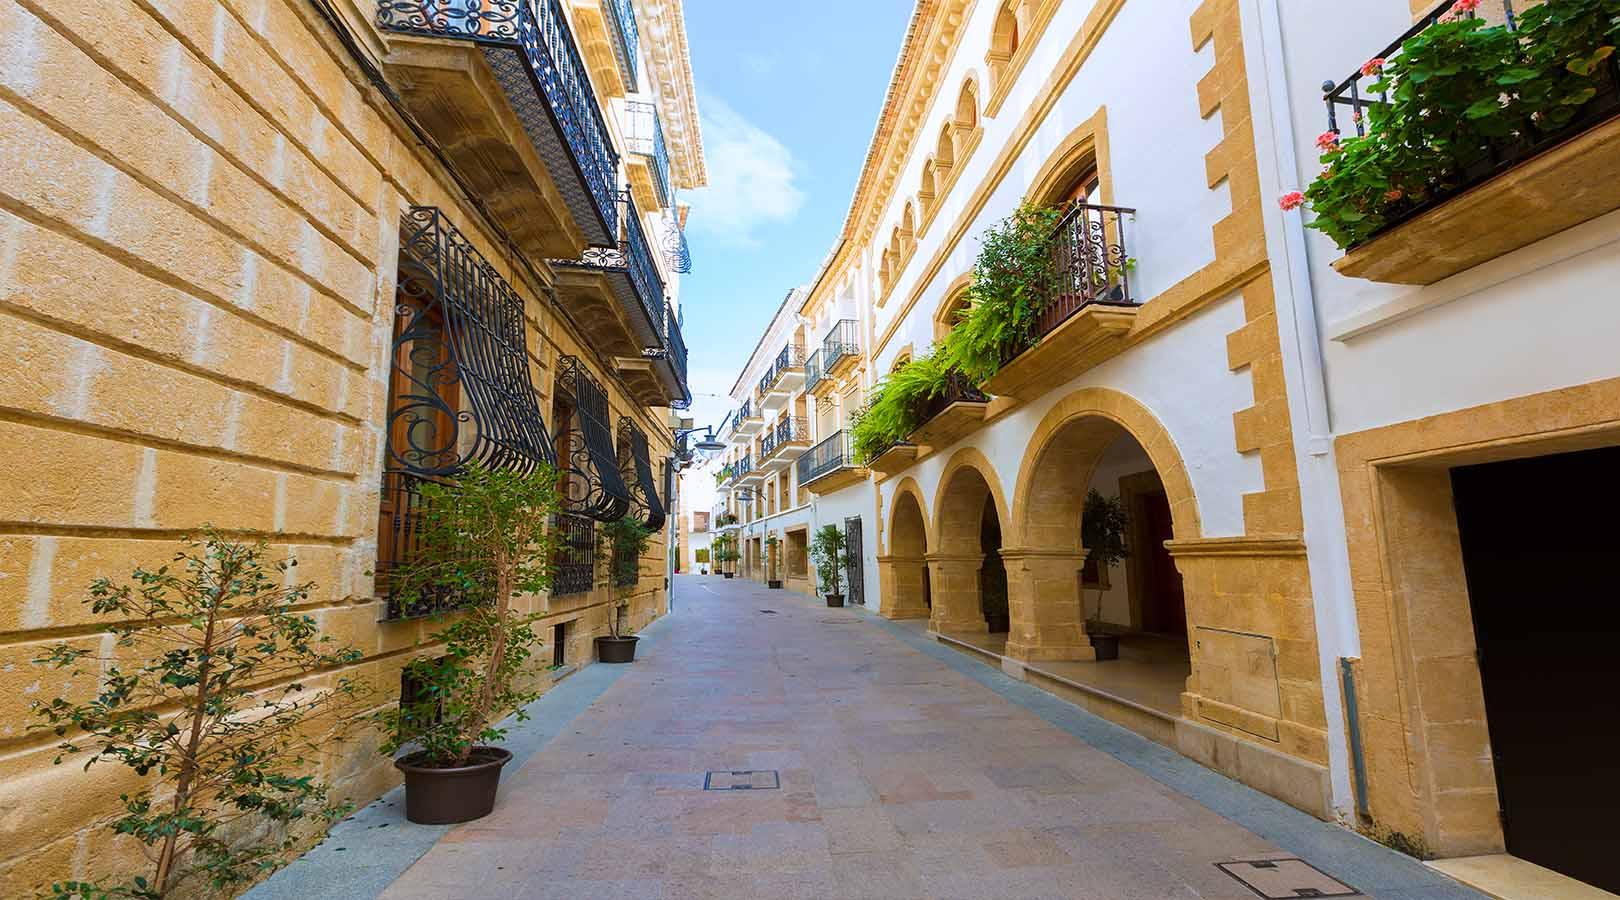 Javea Old Town